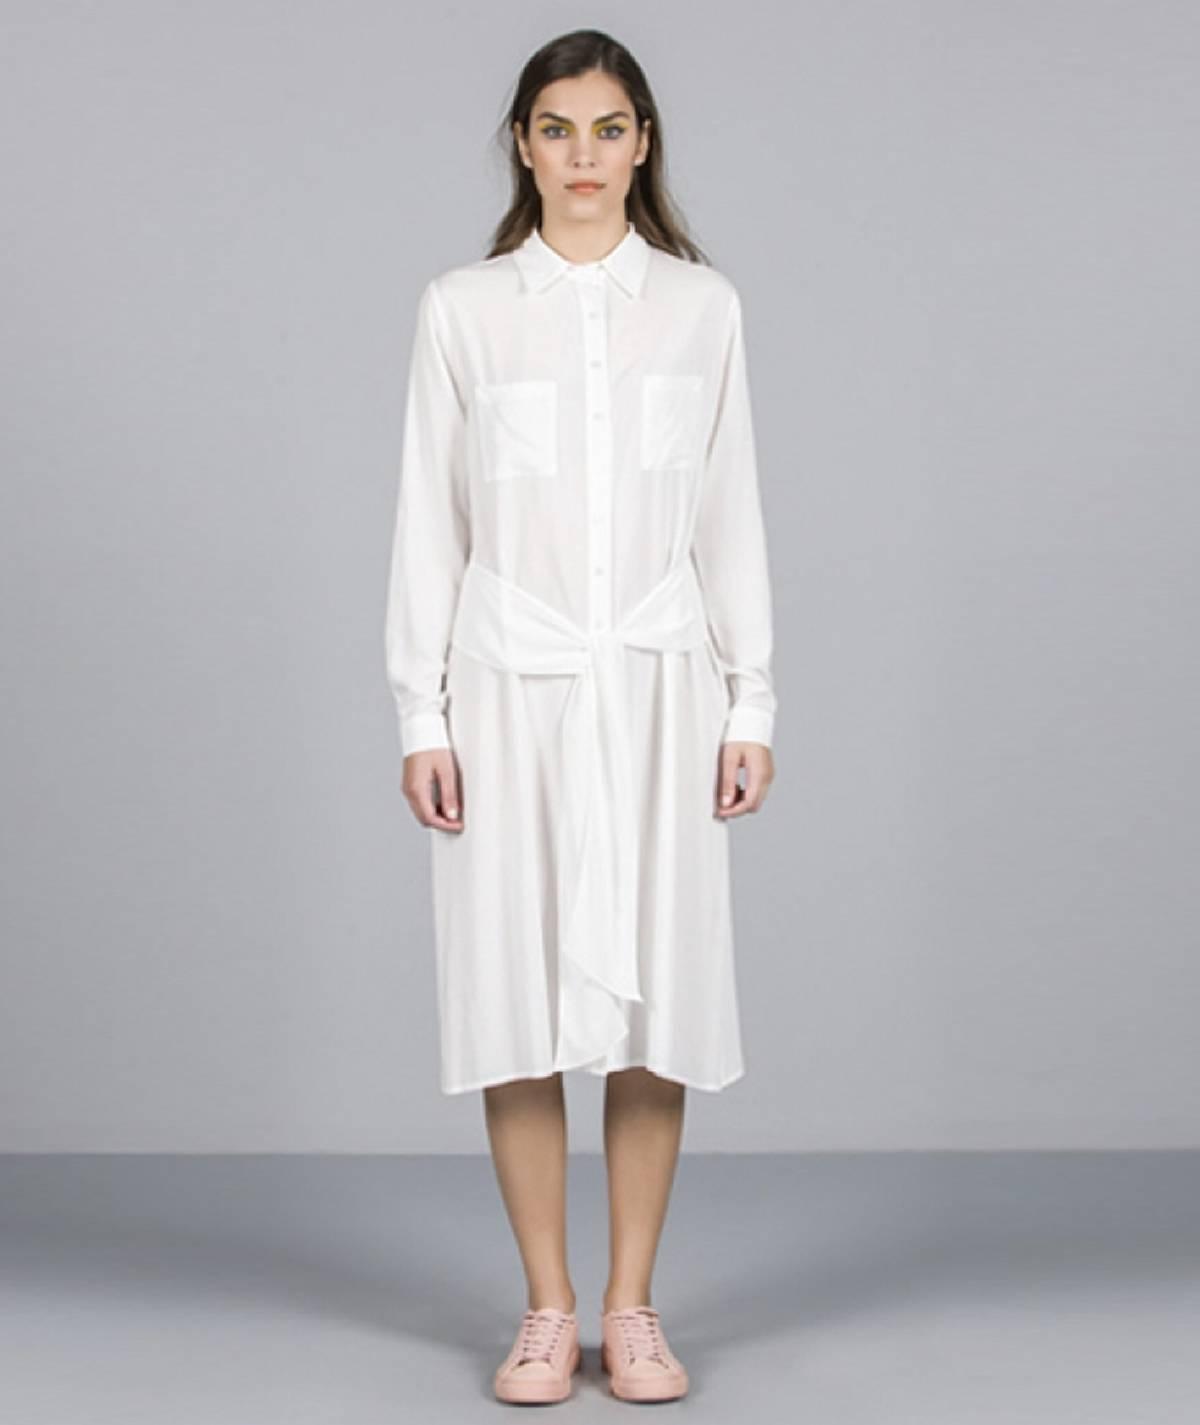 [CHIESSY] Vestido camiseiro